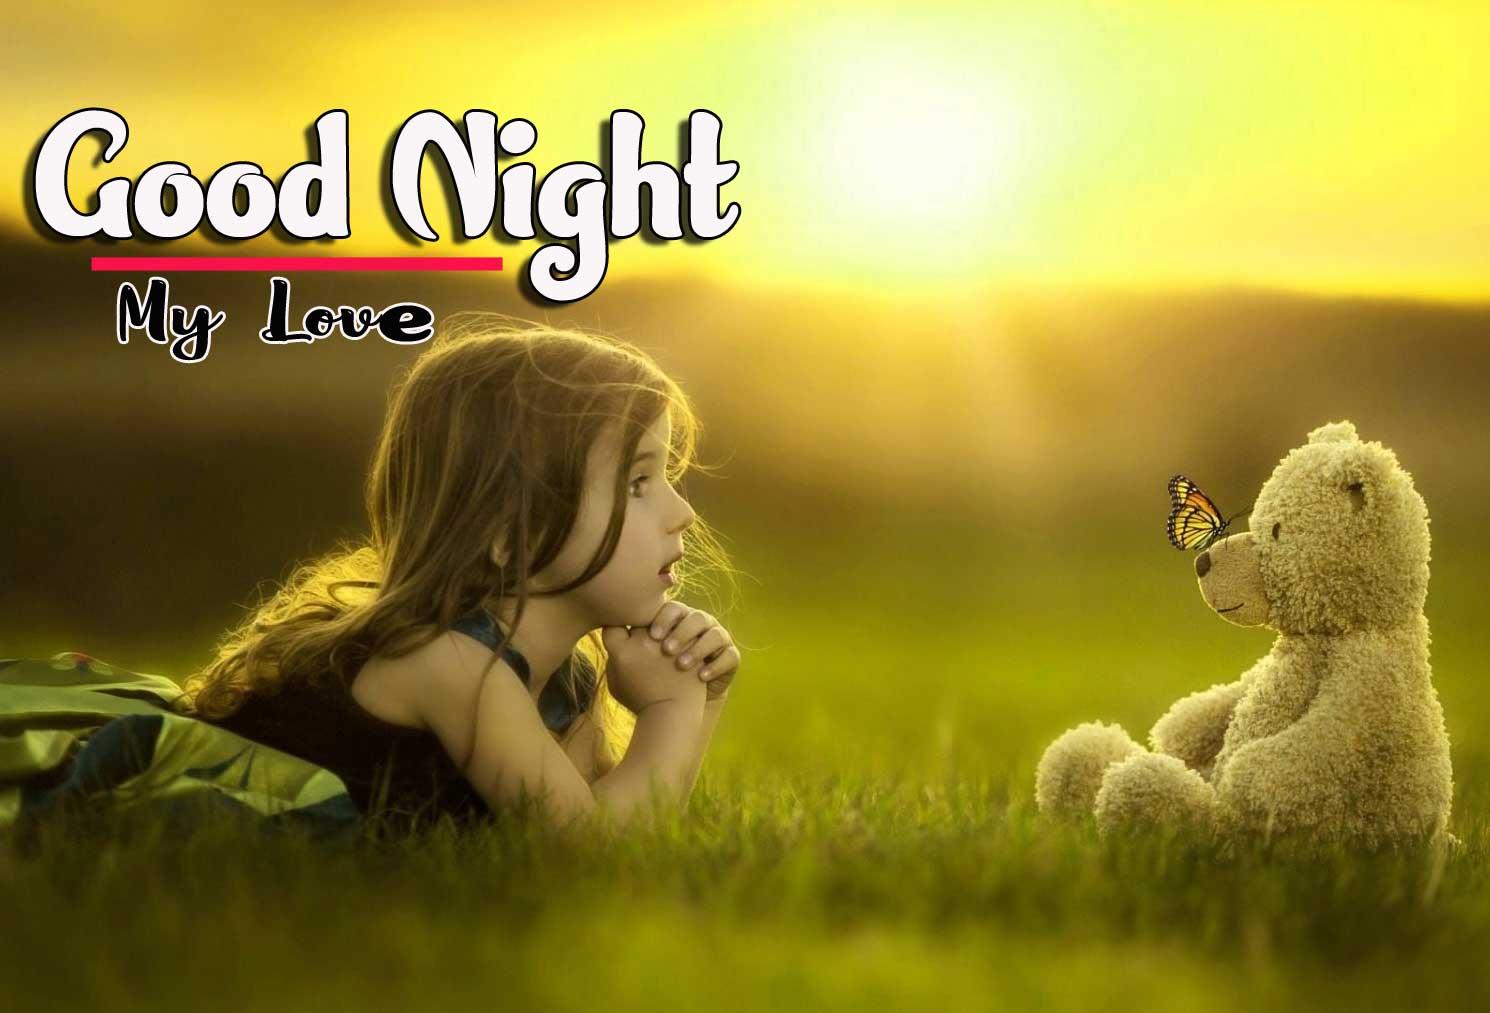 Cute Good Night Images 4k 1080p Pics Wallpaper Download